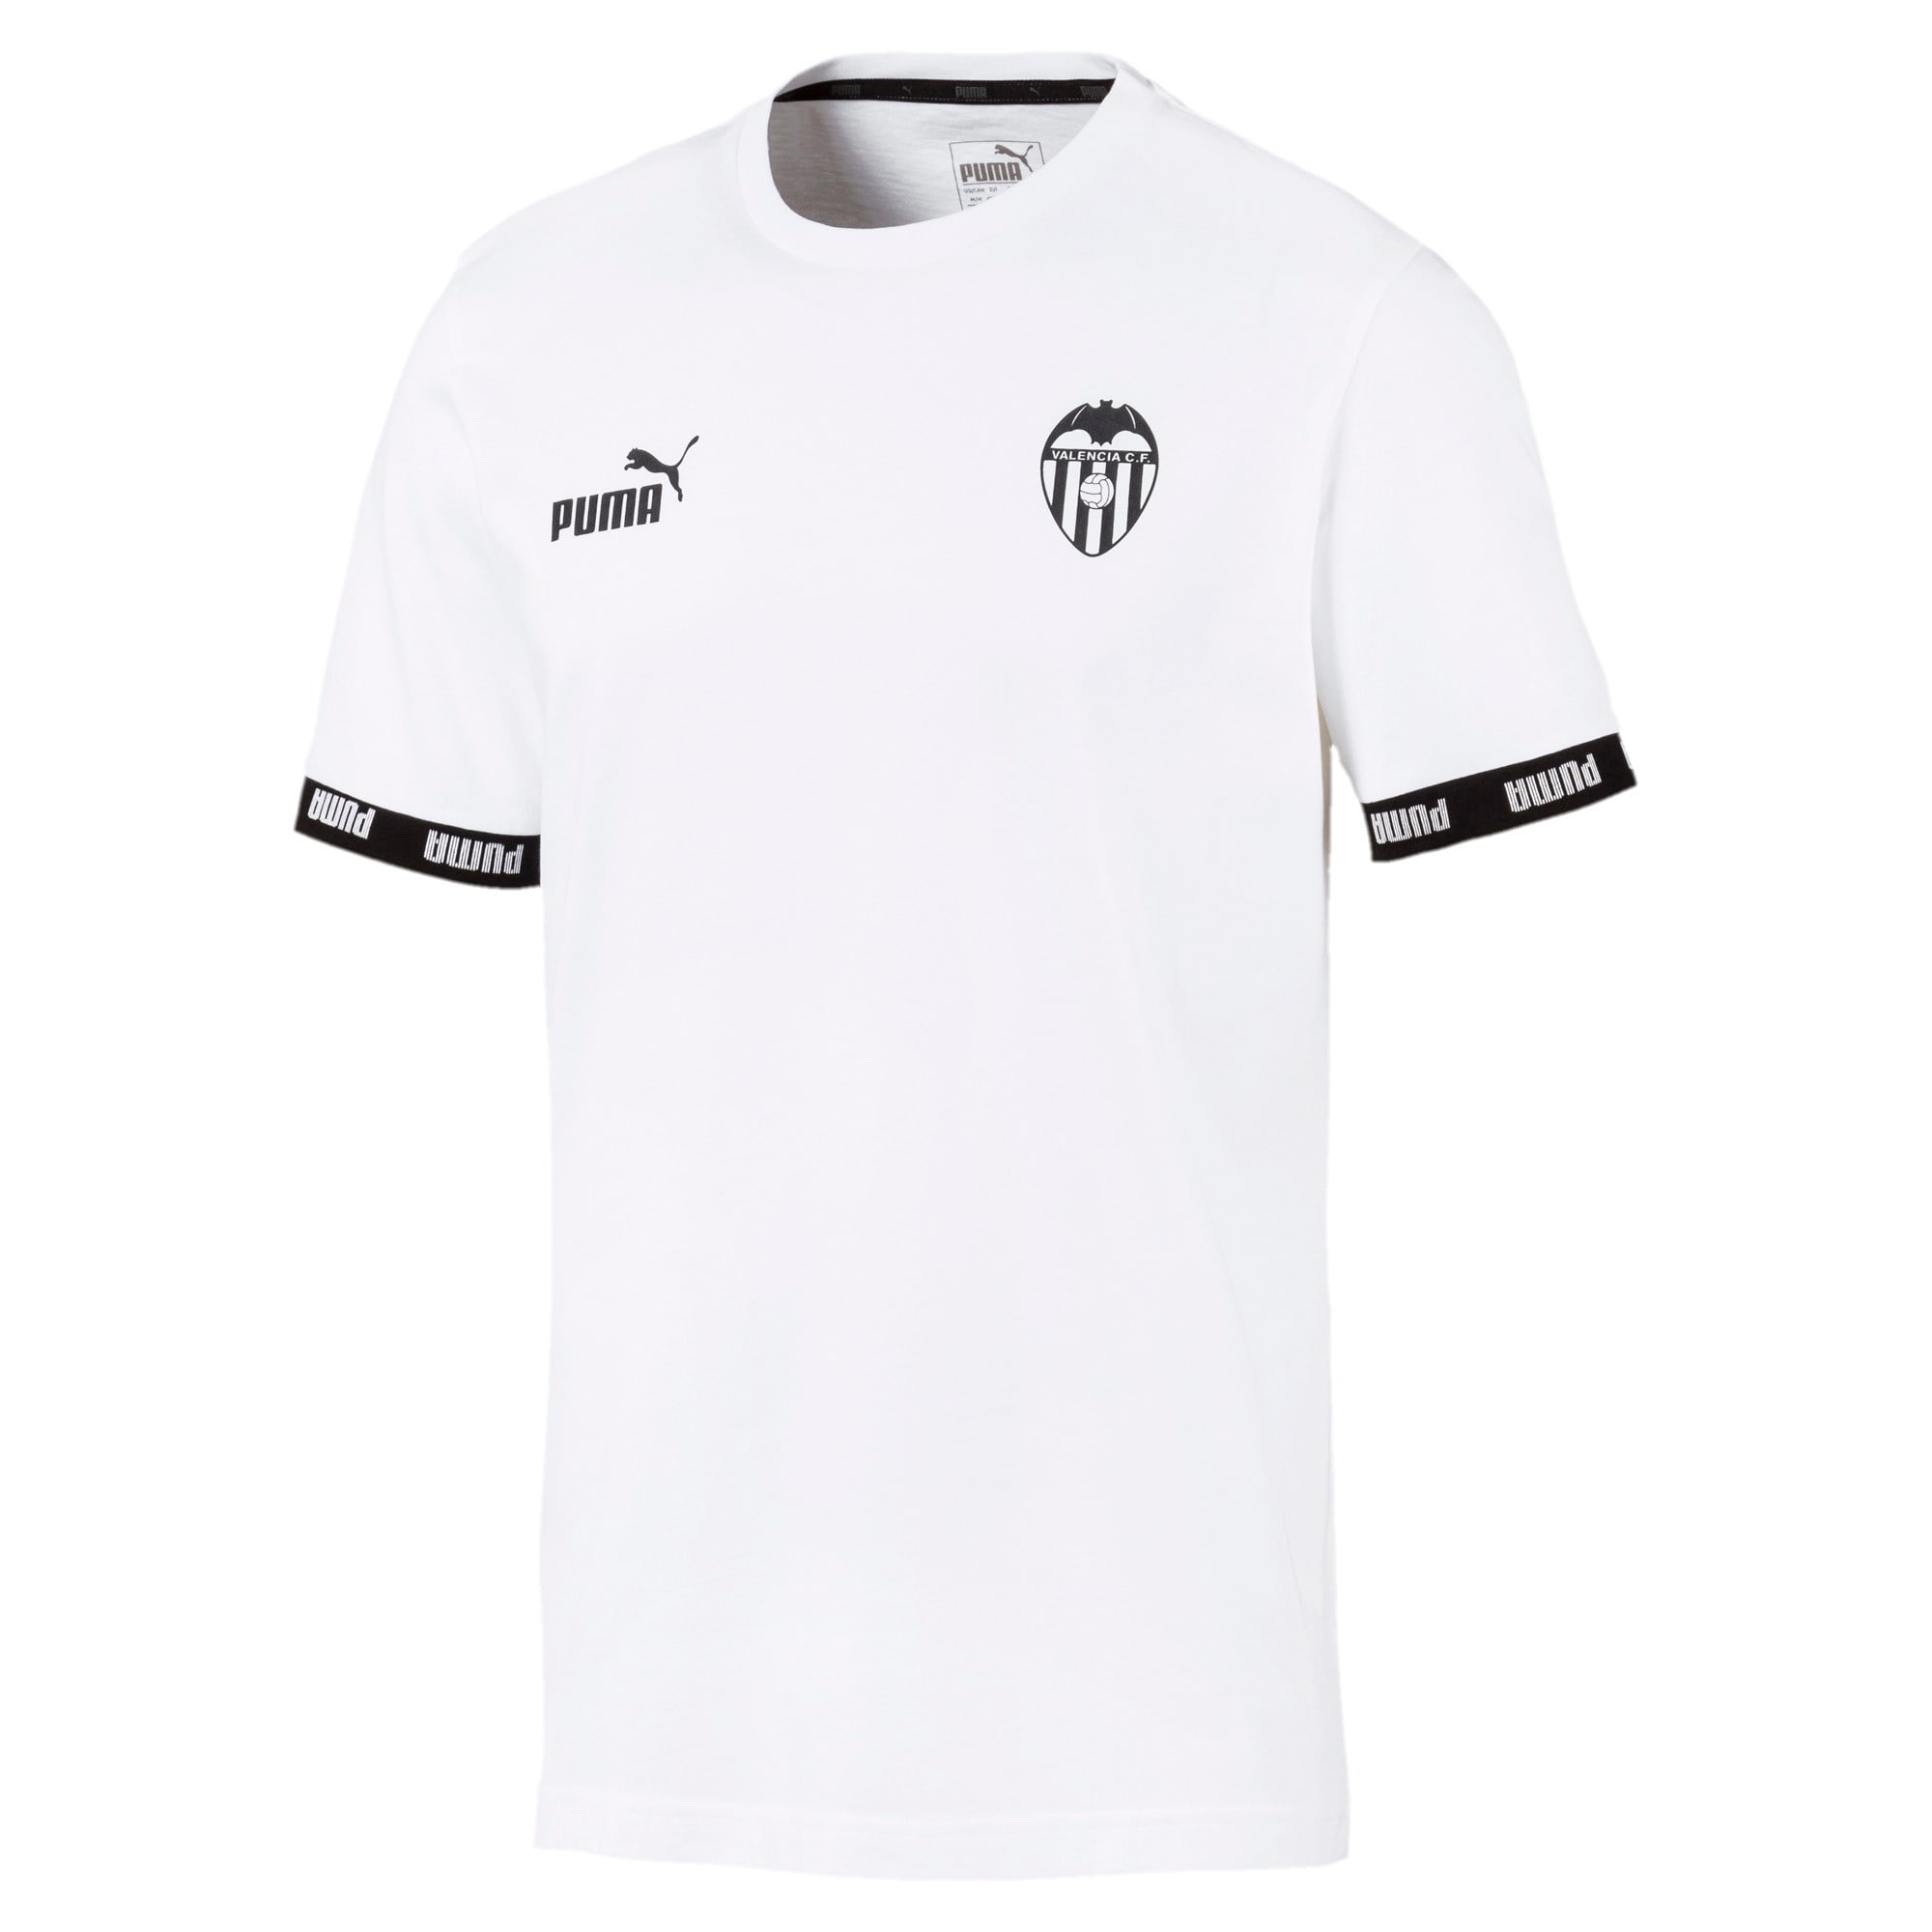 Thumbnail 1 of Valencia CF Football Culture Men's Tee, Puma White, medium